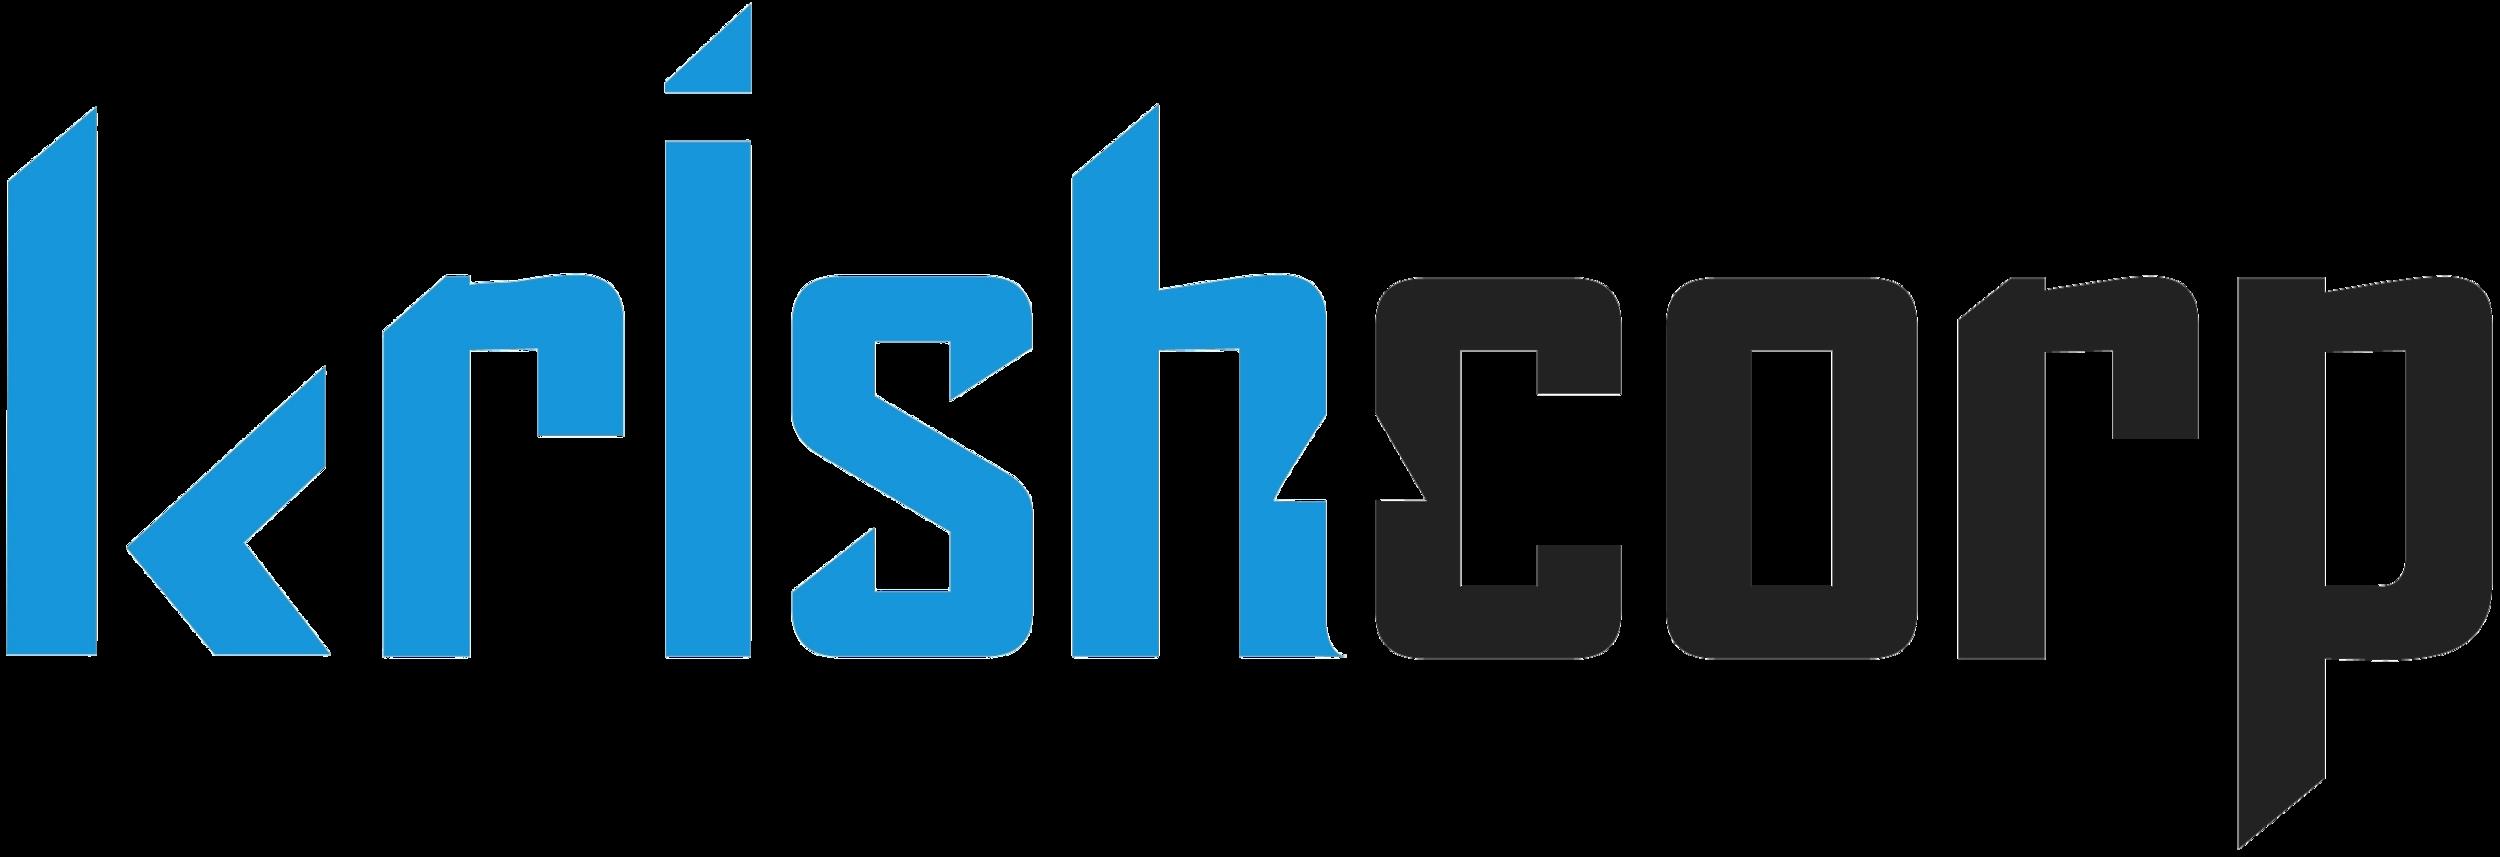 Krish Corp